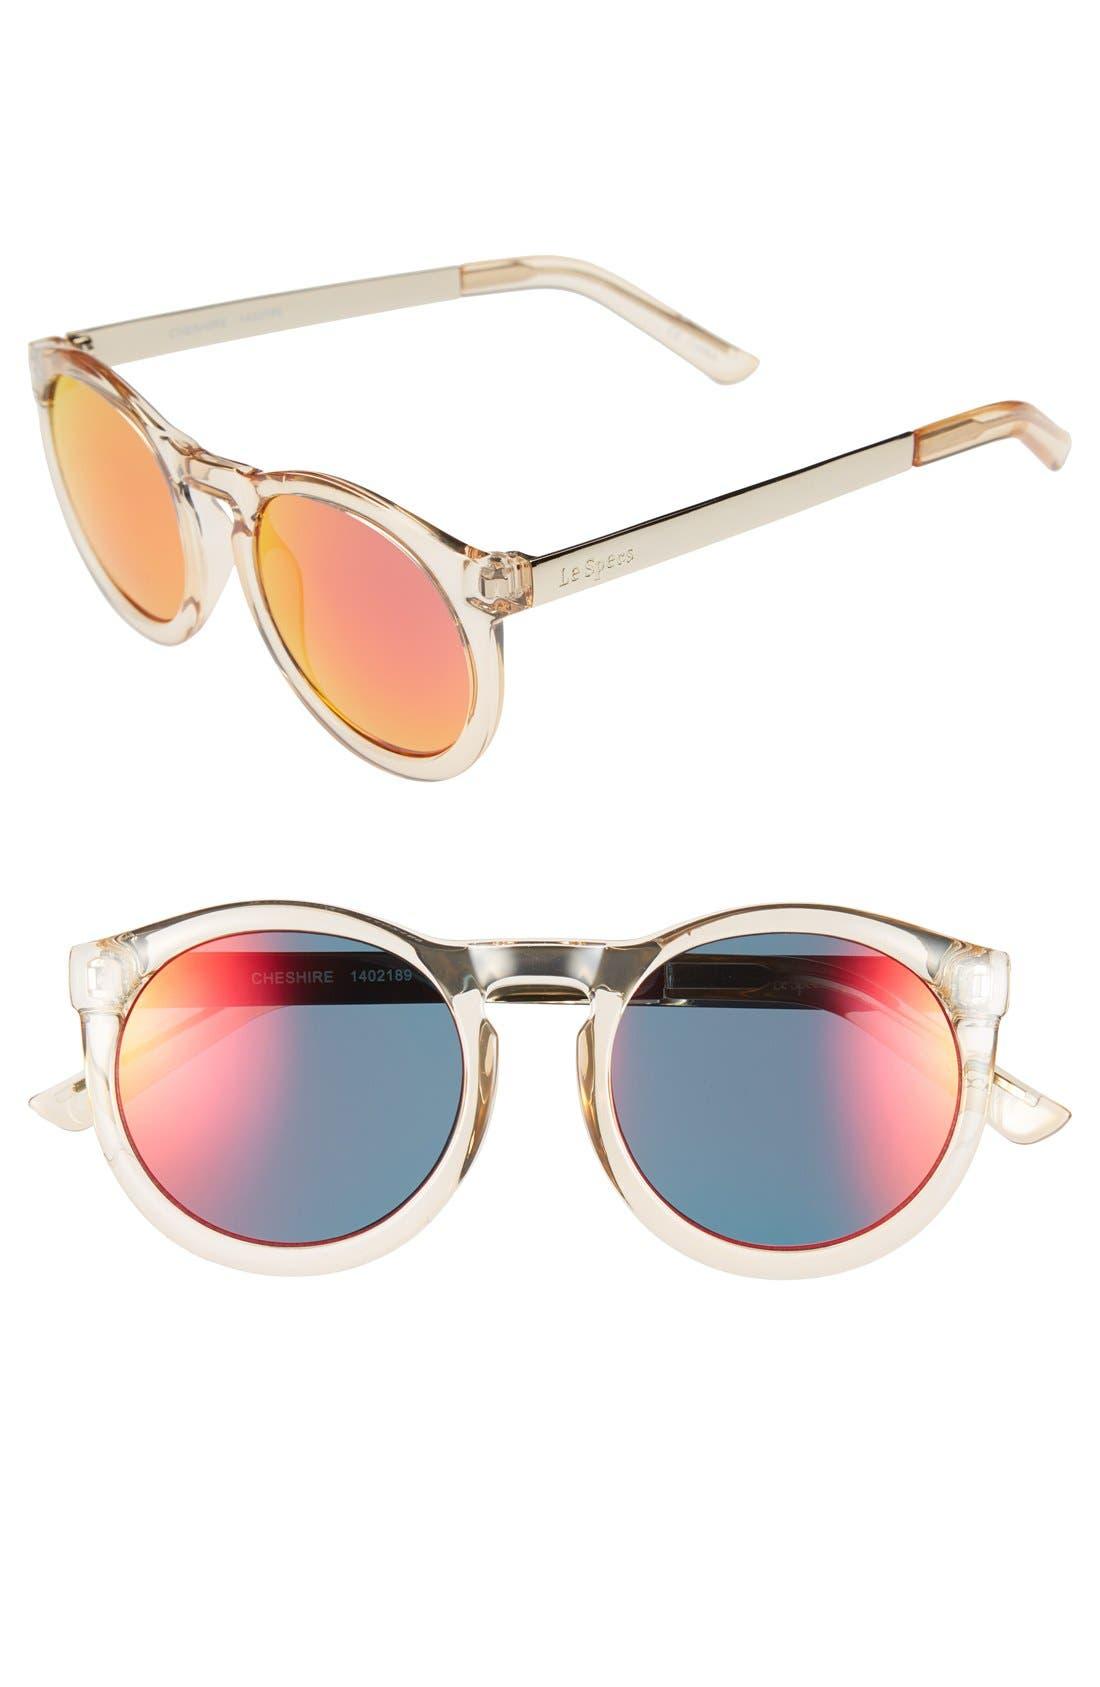 Alternate Image 1 Selected - Le Specs 'Cheshire' 49mm Round Retro Sunglasses